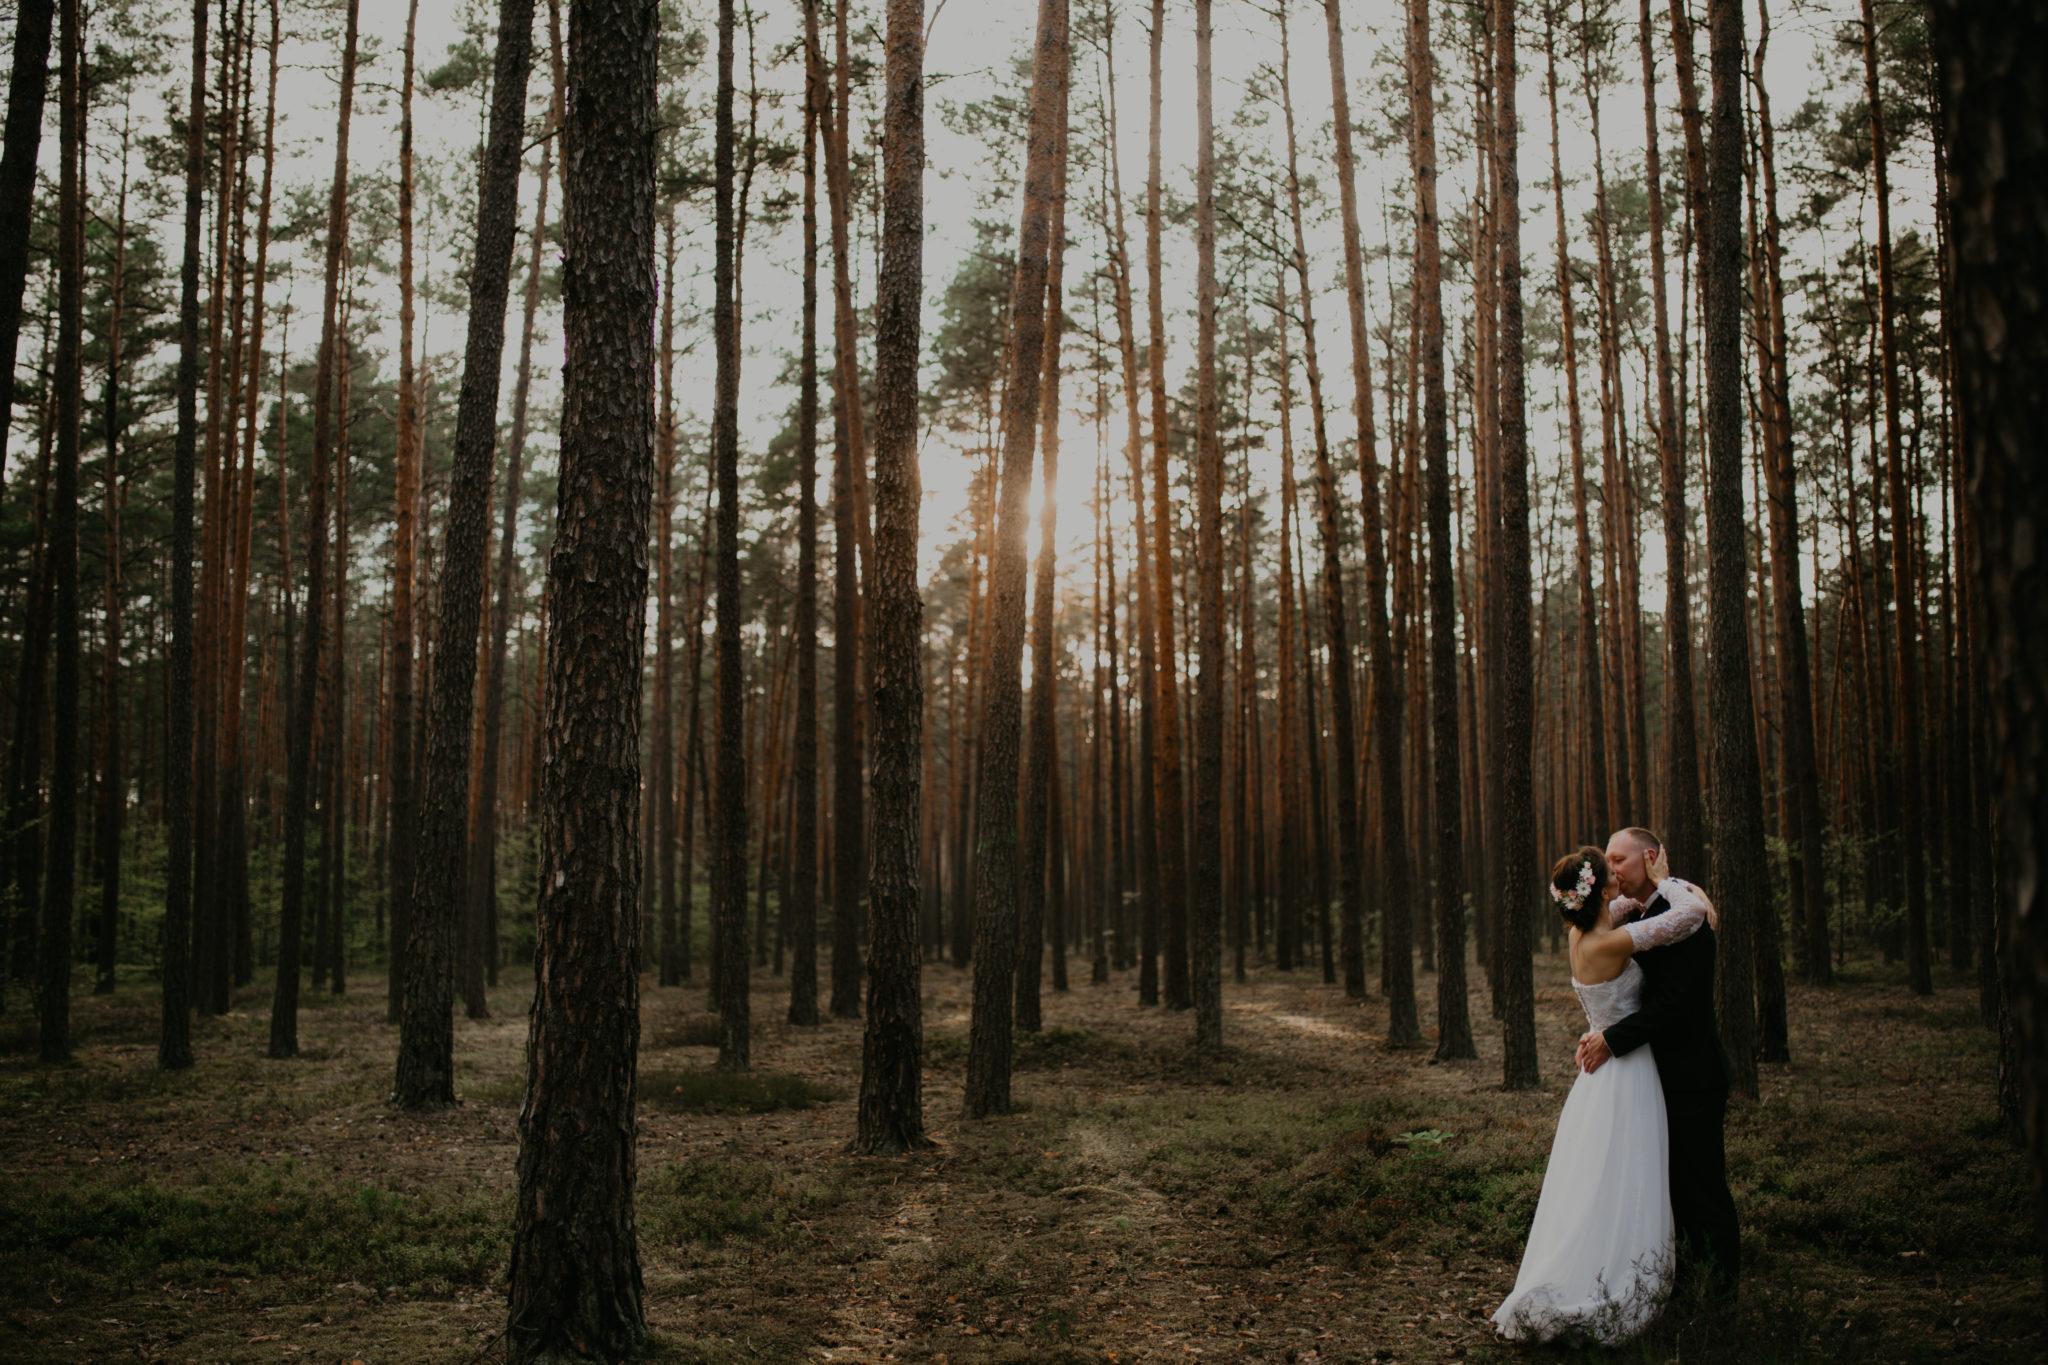 gosia i kubaplener 9 1 - fotografiagk Fotografia ślubna RK wedding